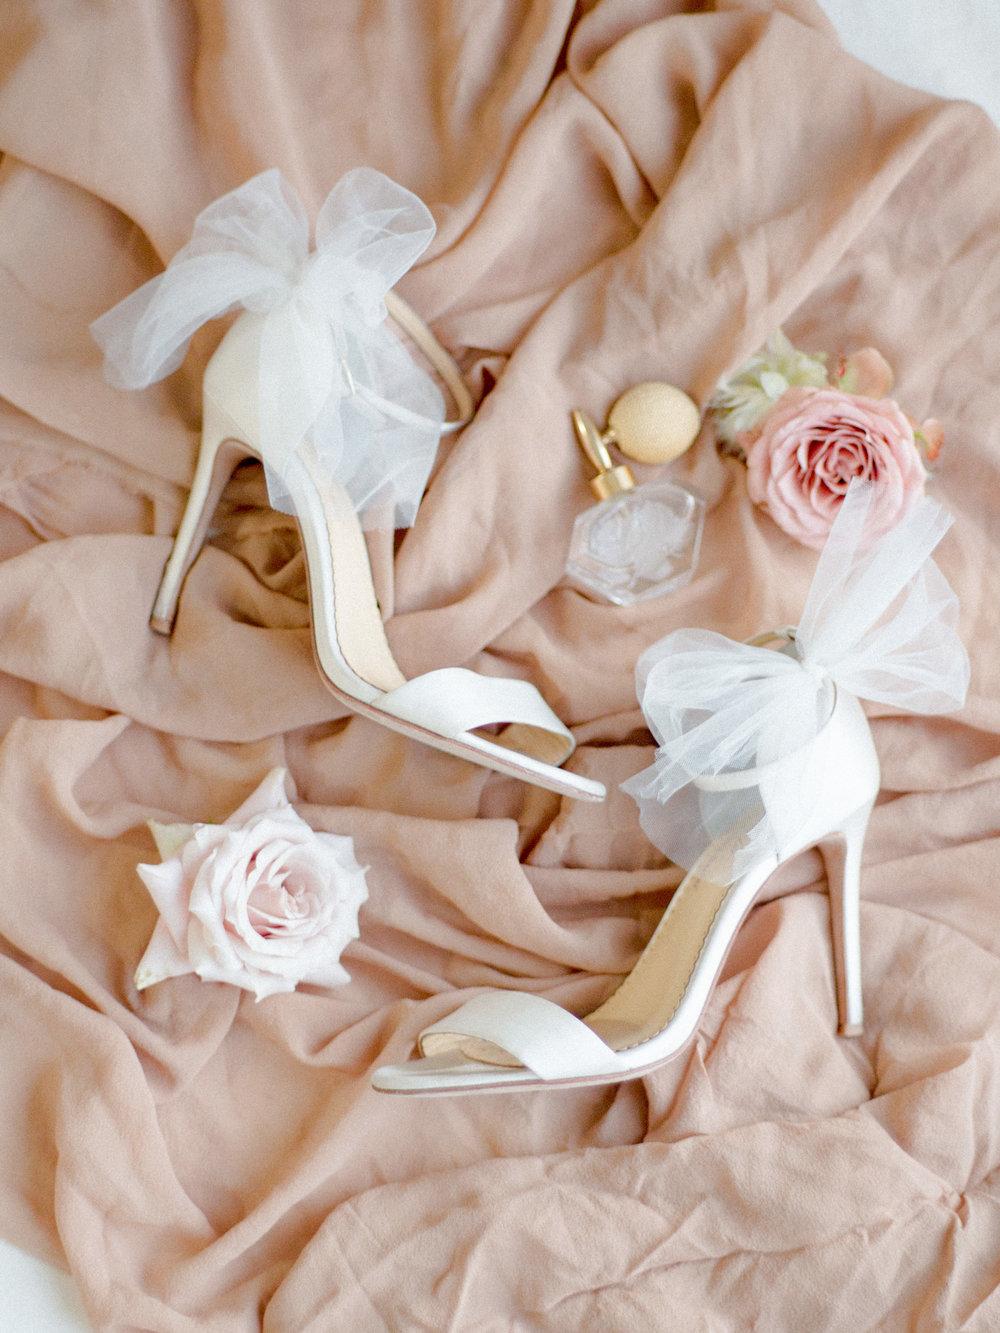 JennySoiPhotography-BridalBoudoireditorial-121.jpg